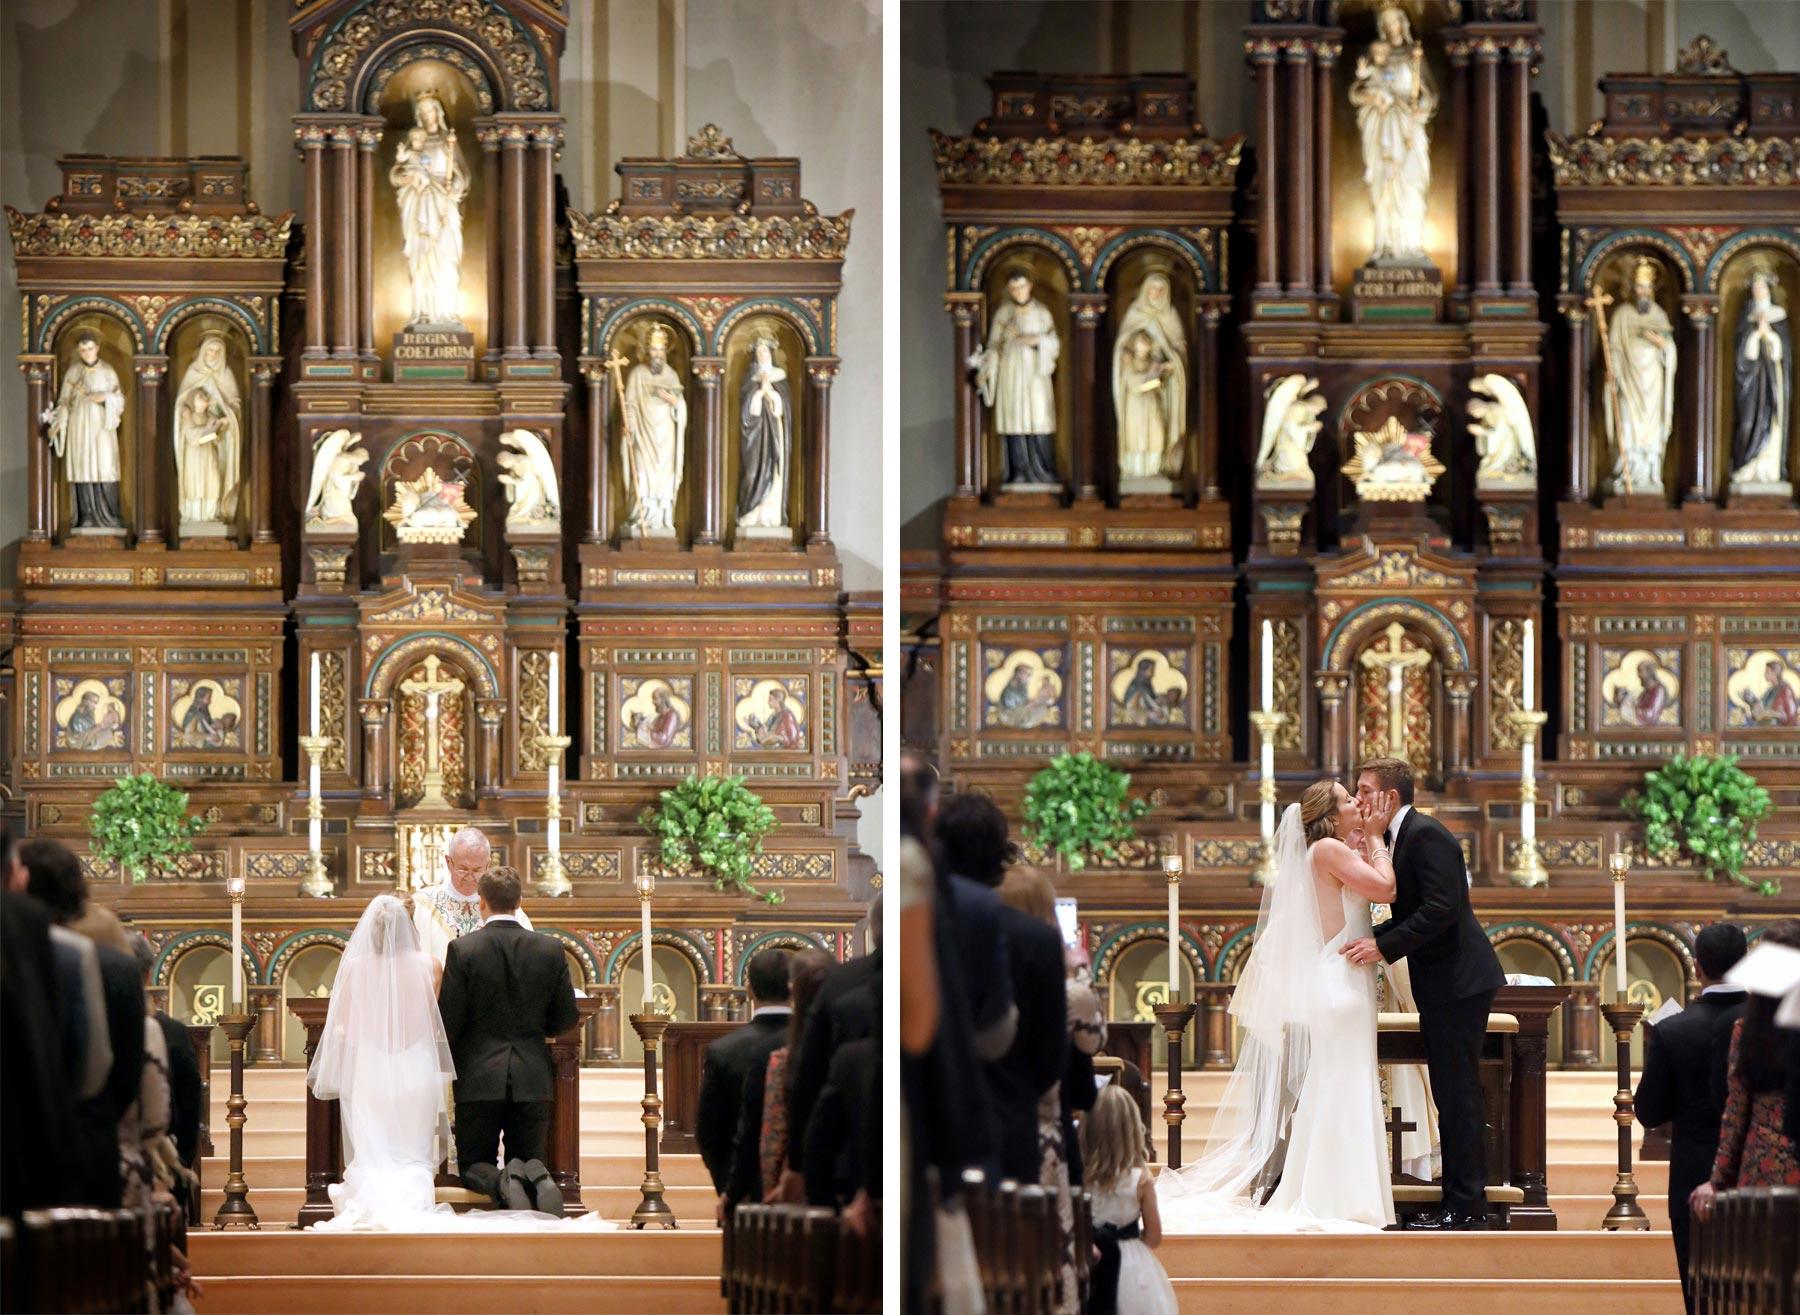 09-Saint-Paul-Minnesota-Wedding-Photographer-by-Andrew-Vick-Photography-Fall-Autumn-Church-of-the-Assumption-Ceremony-Bride-Groom-Vows-Kiss-Kathryn-and-Sam.jpg